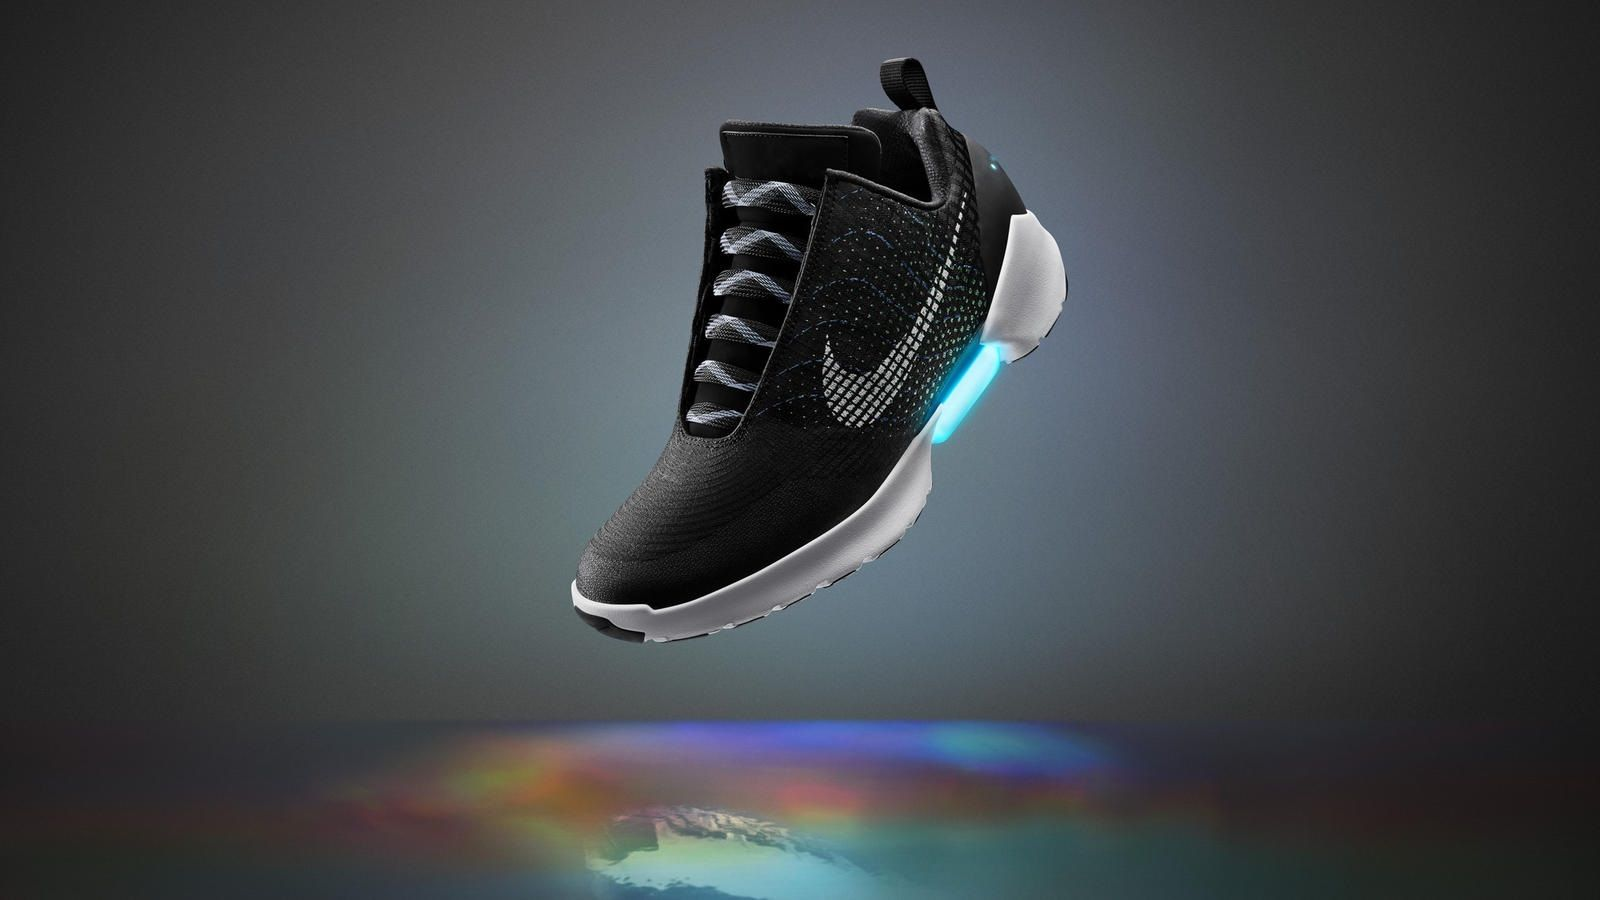 ronaldo nike shoes